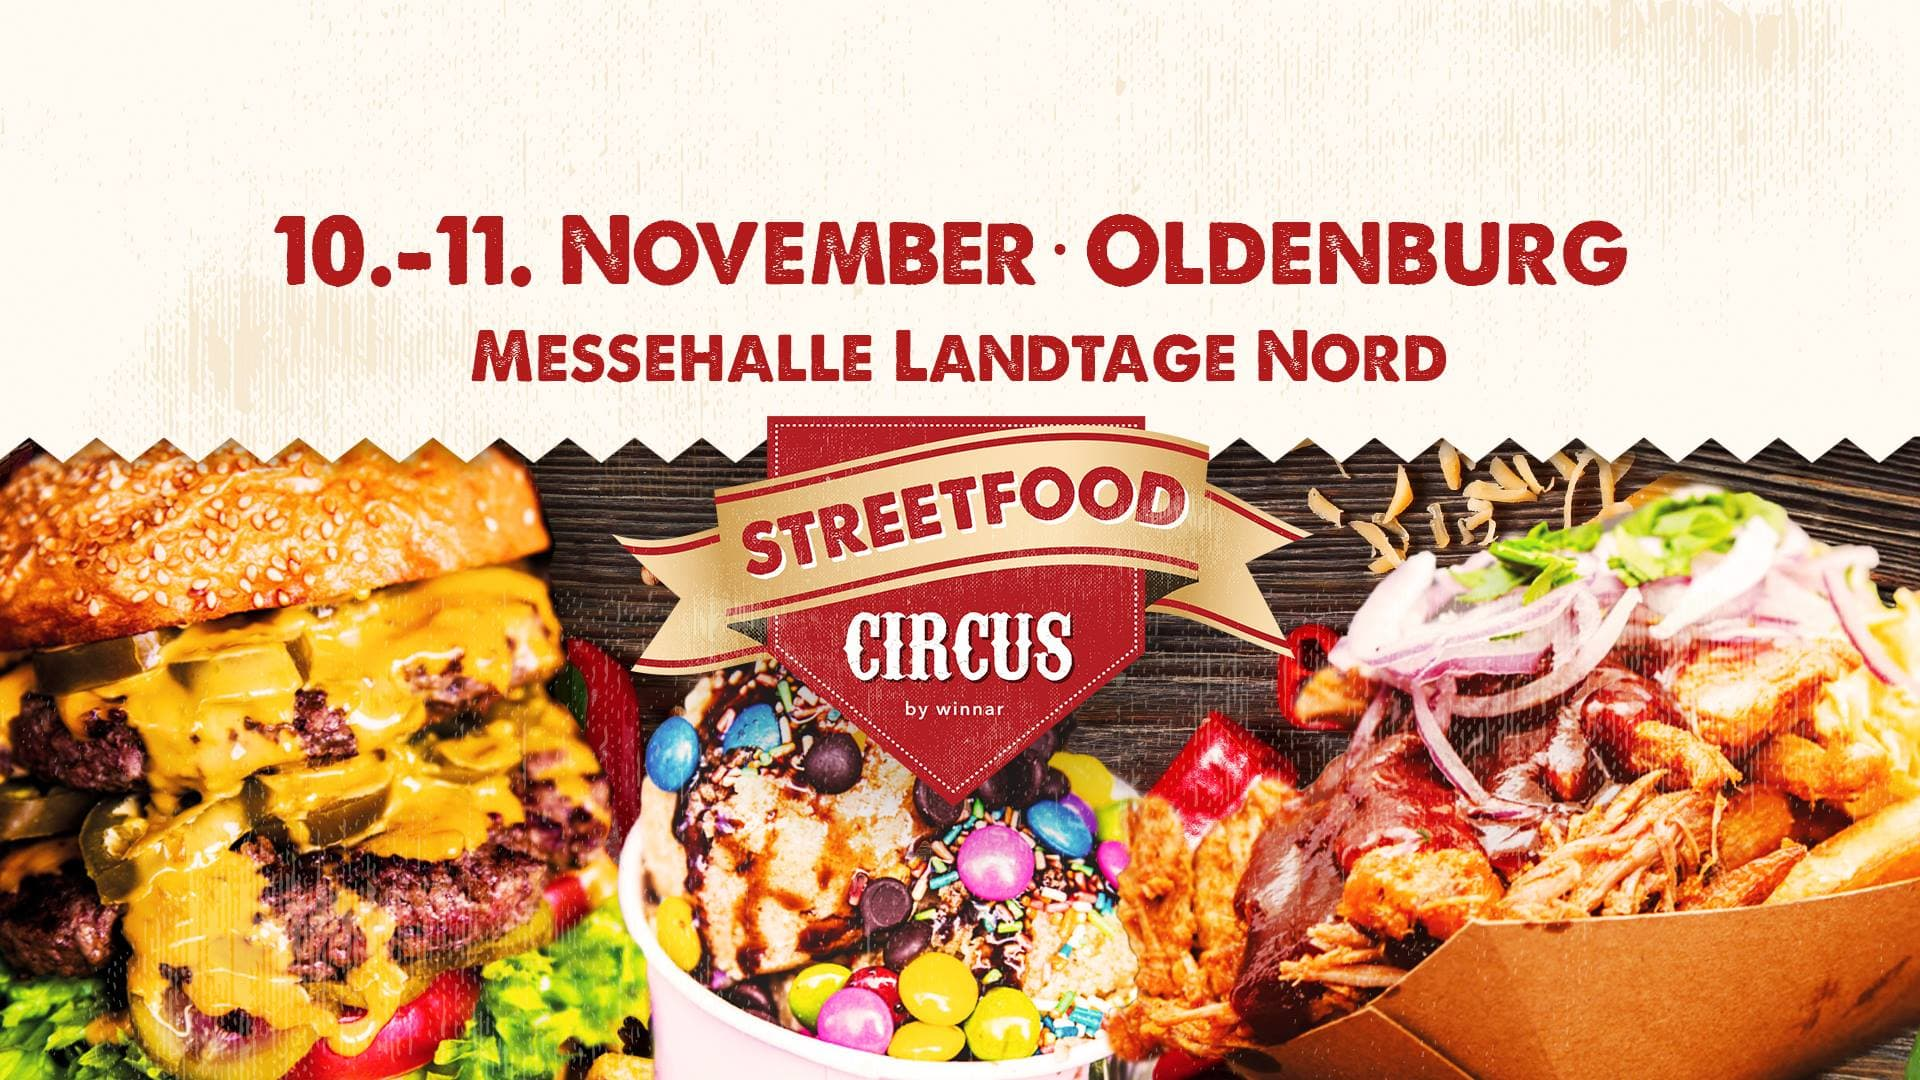 Streetfoodcircus Oldenburg/Wüsting